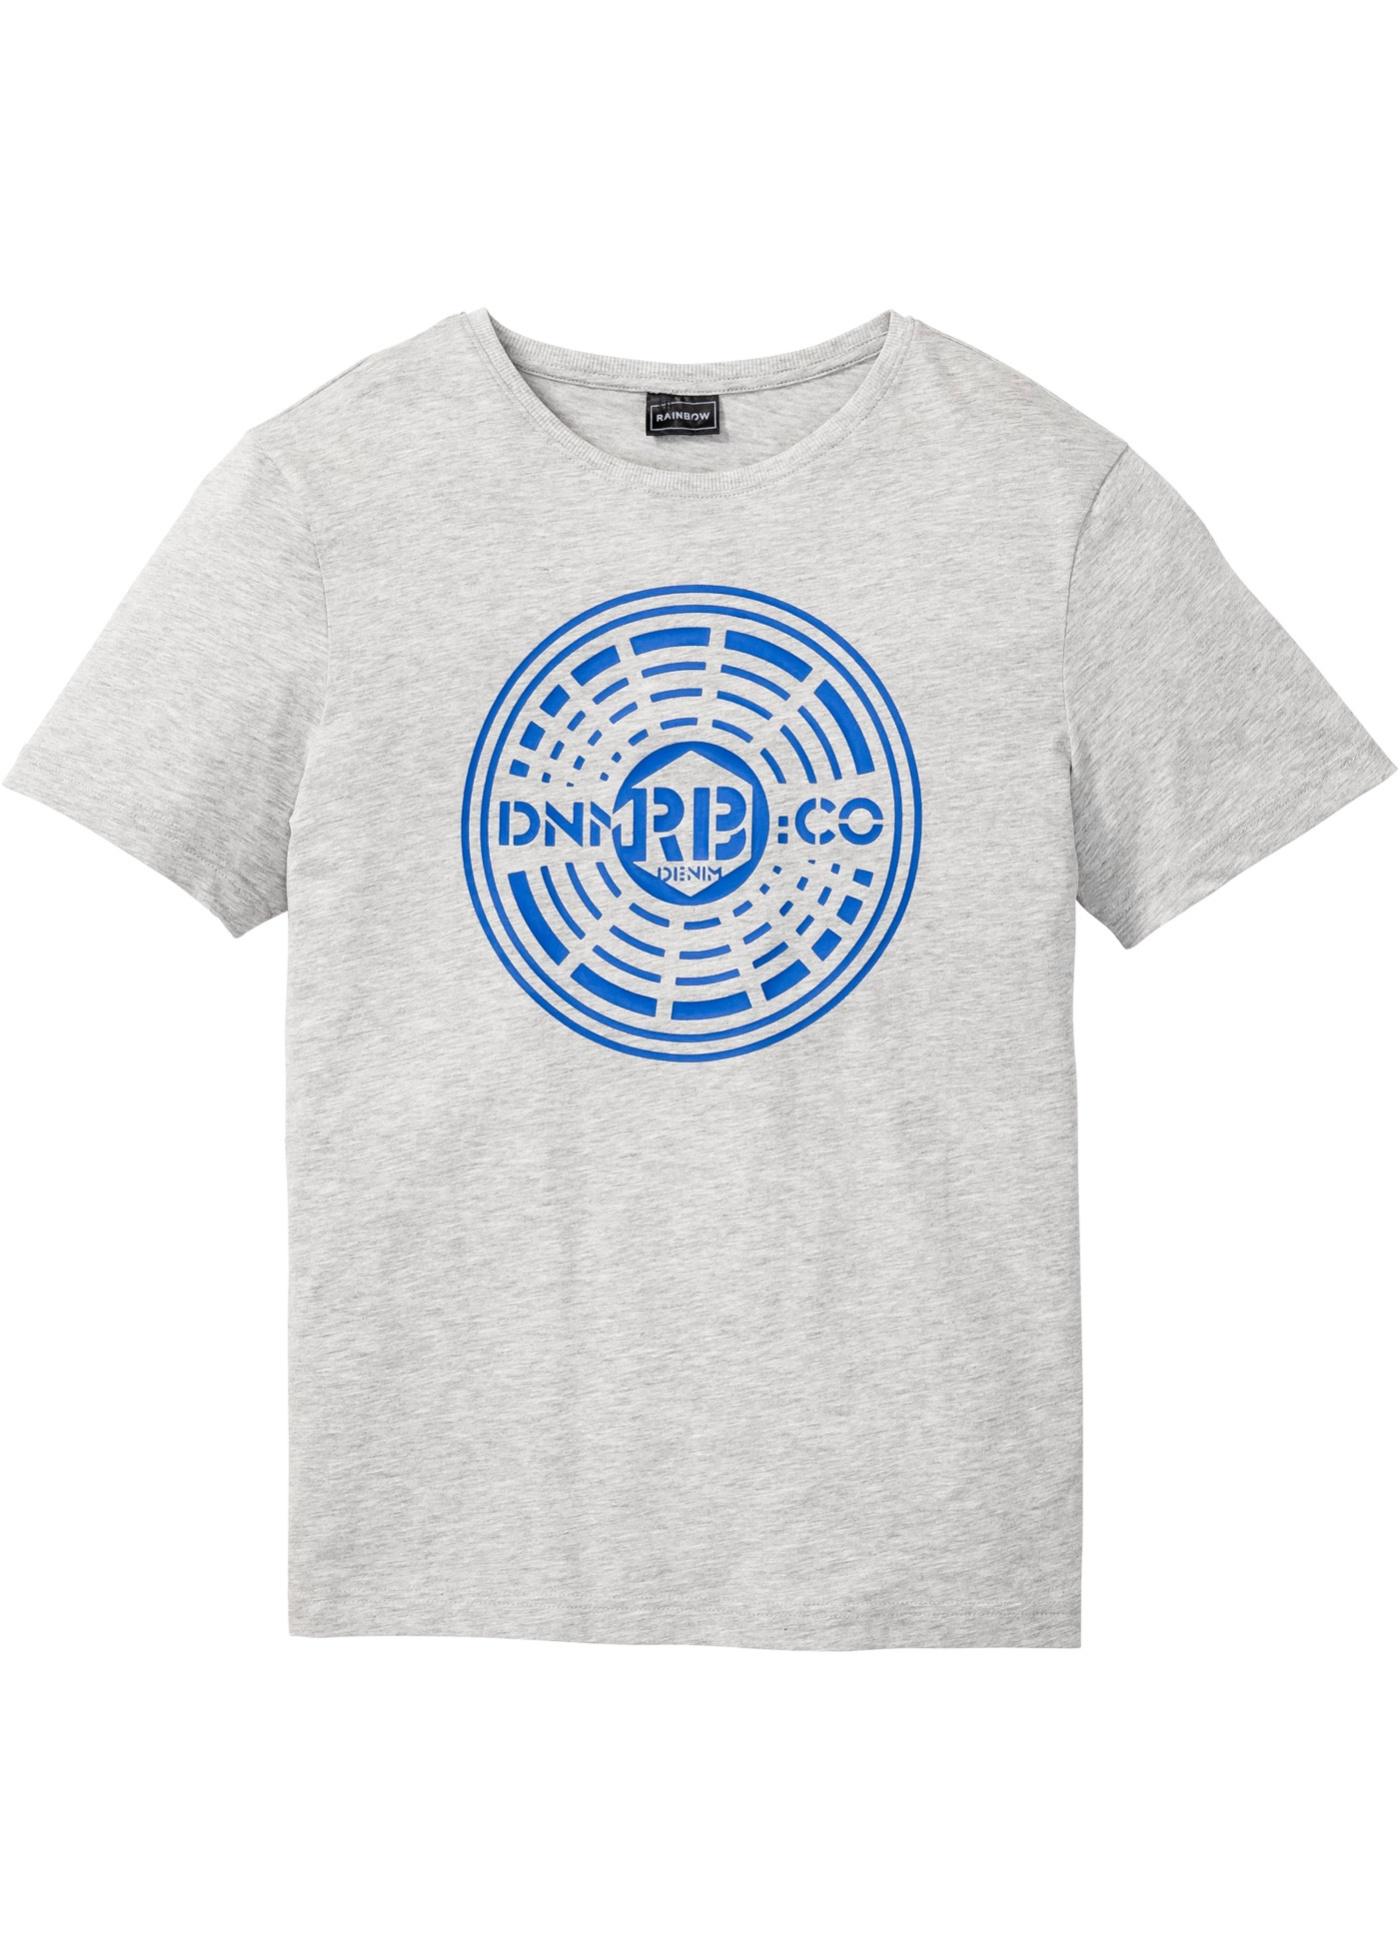 Bonprix - T-shirt med tryck, smal passform 59.00